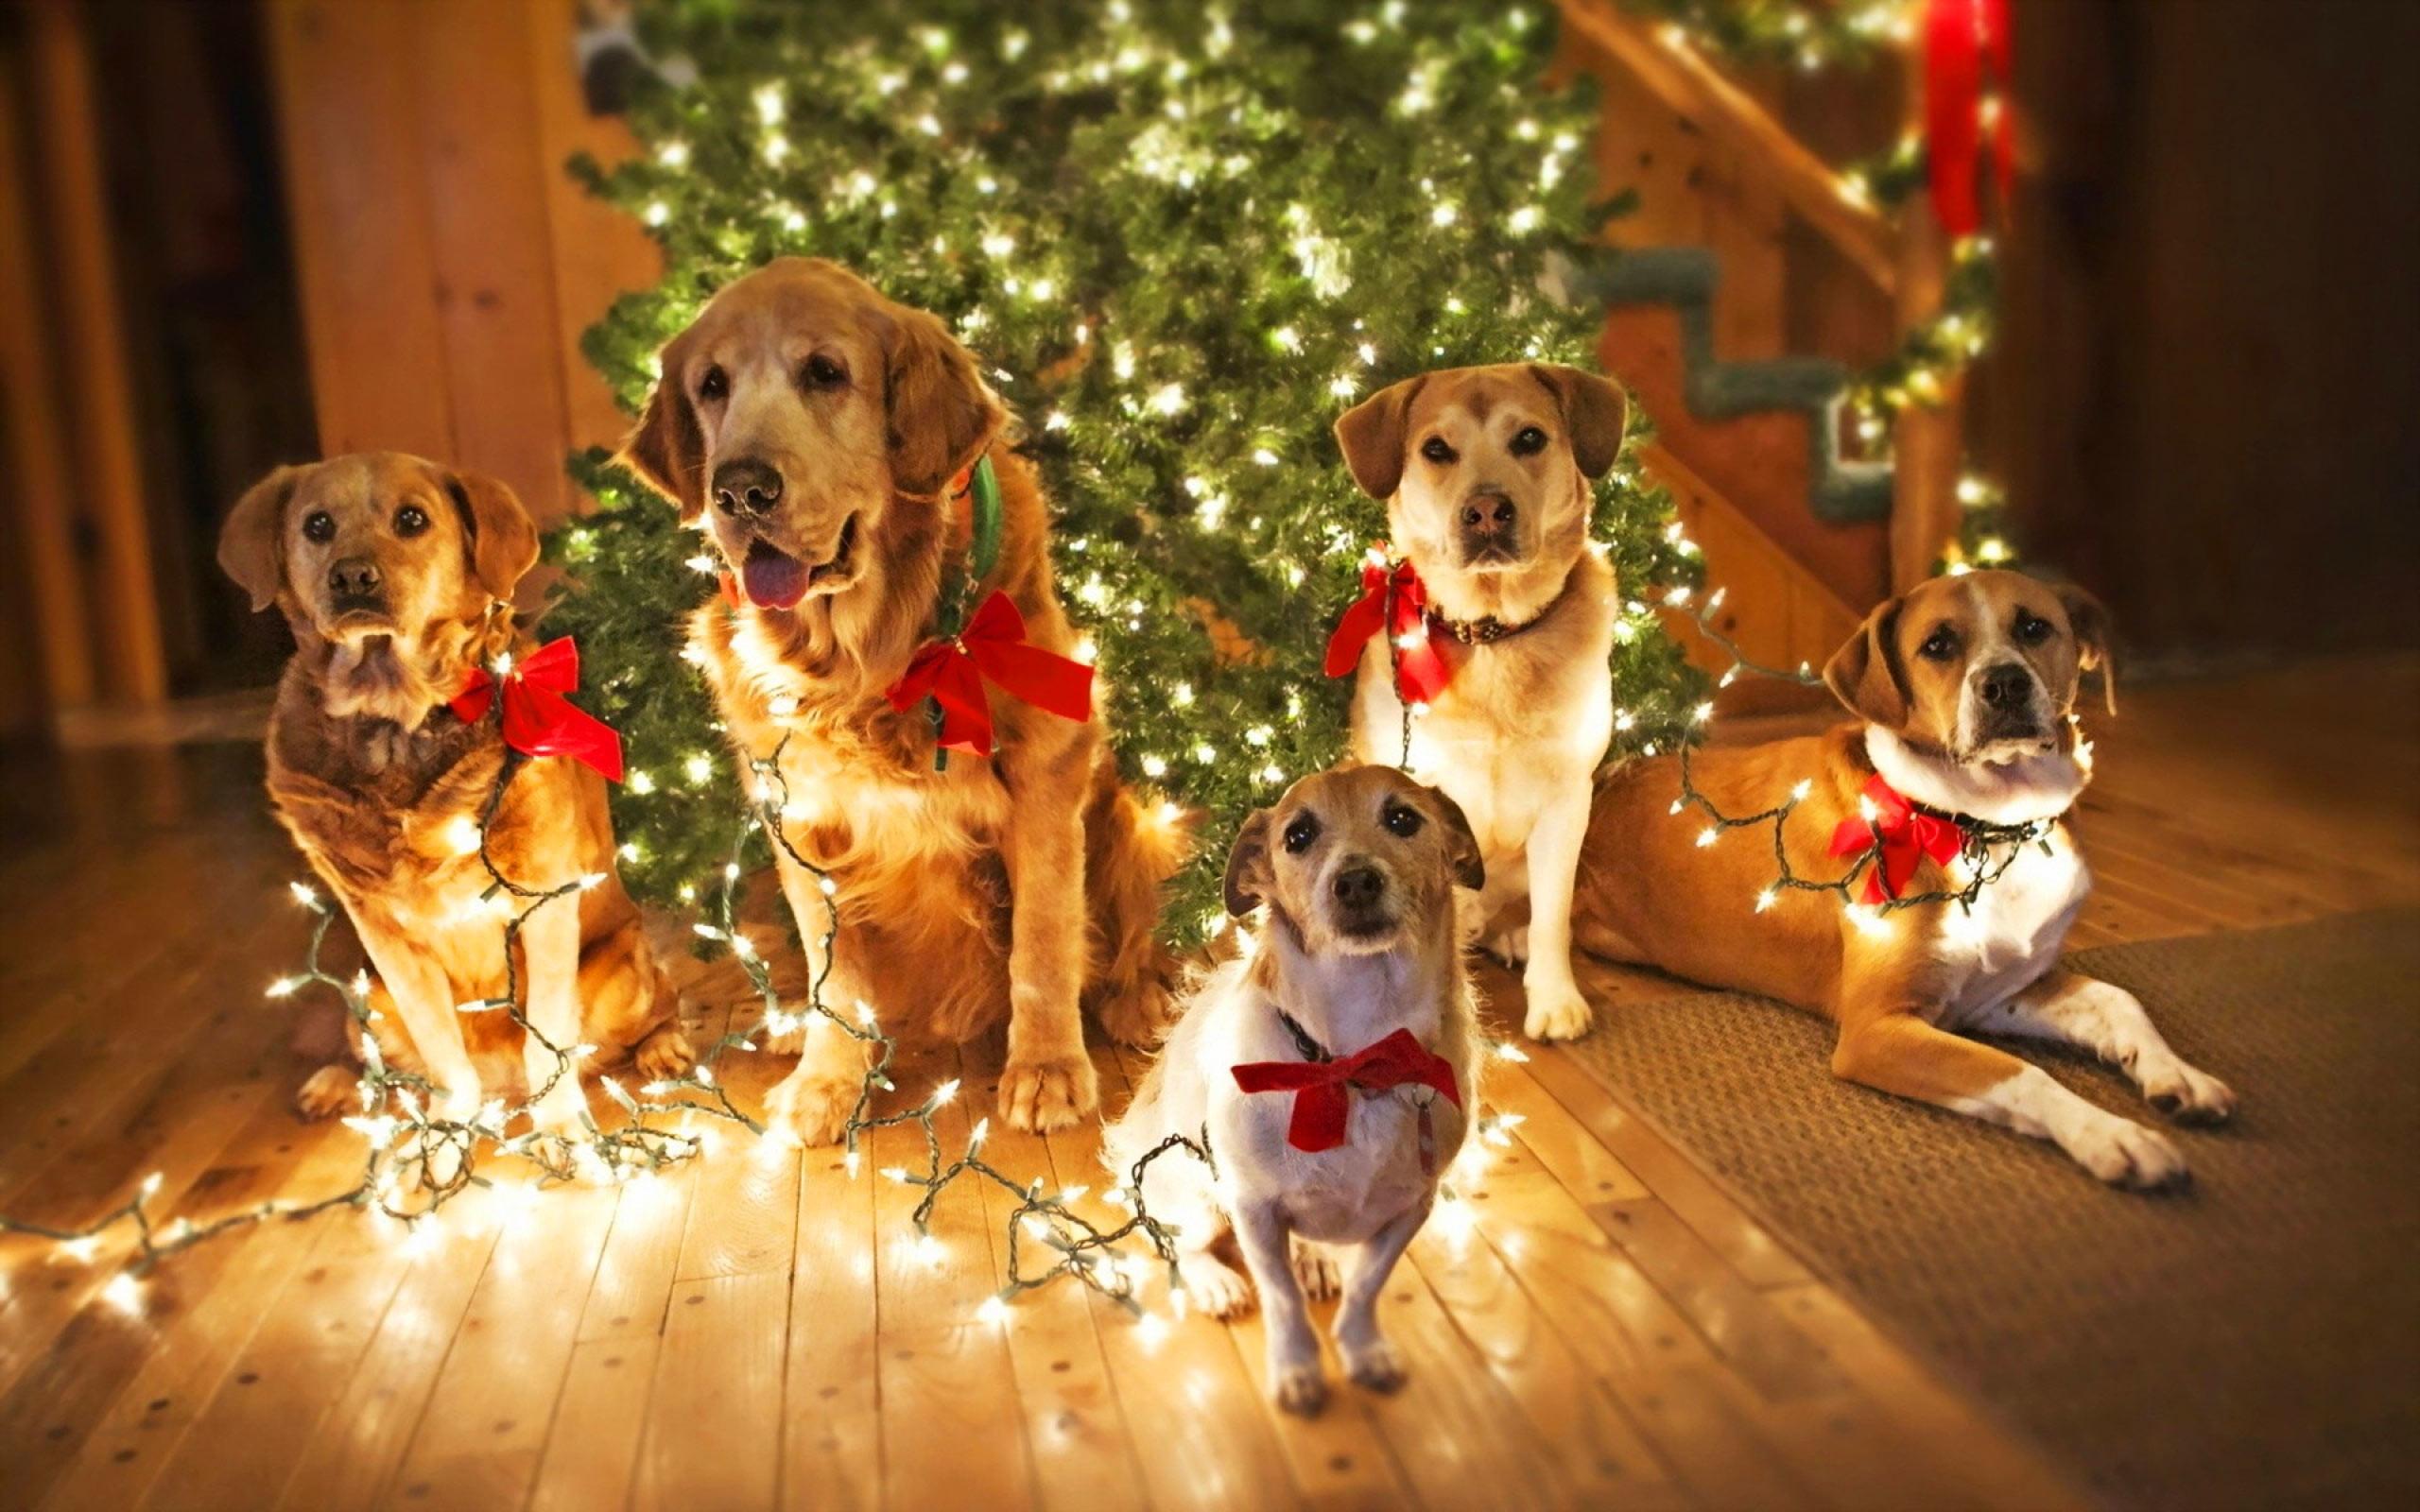 Christmas puter Desktop Wallpaper 52 images